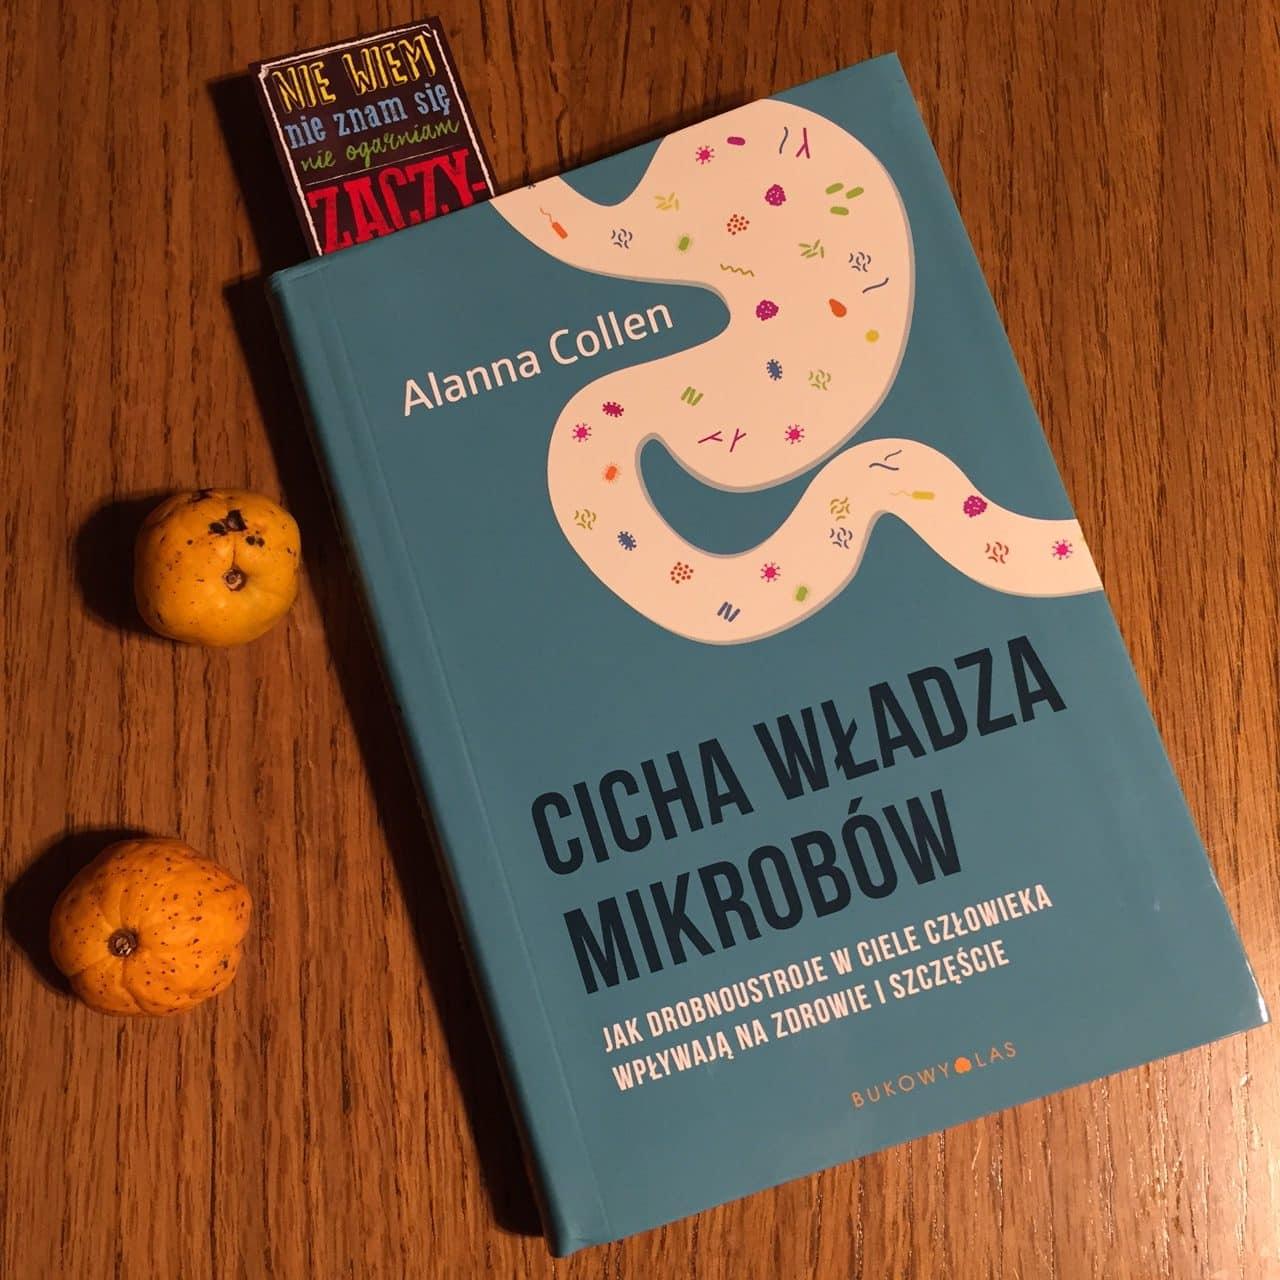 cicha-wladza-mikrobow